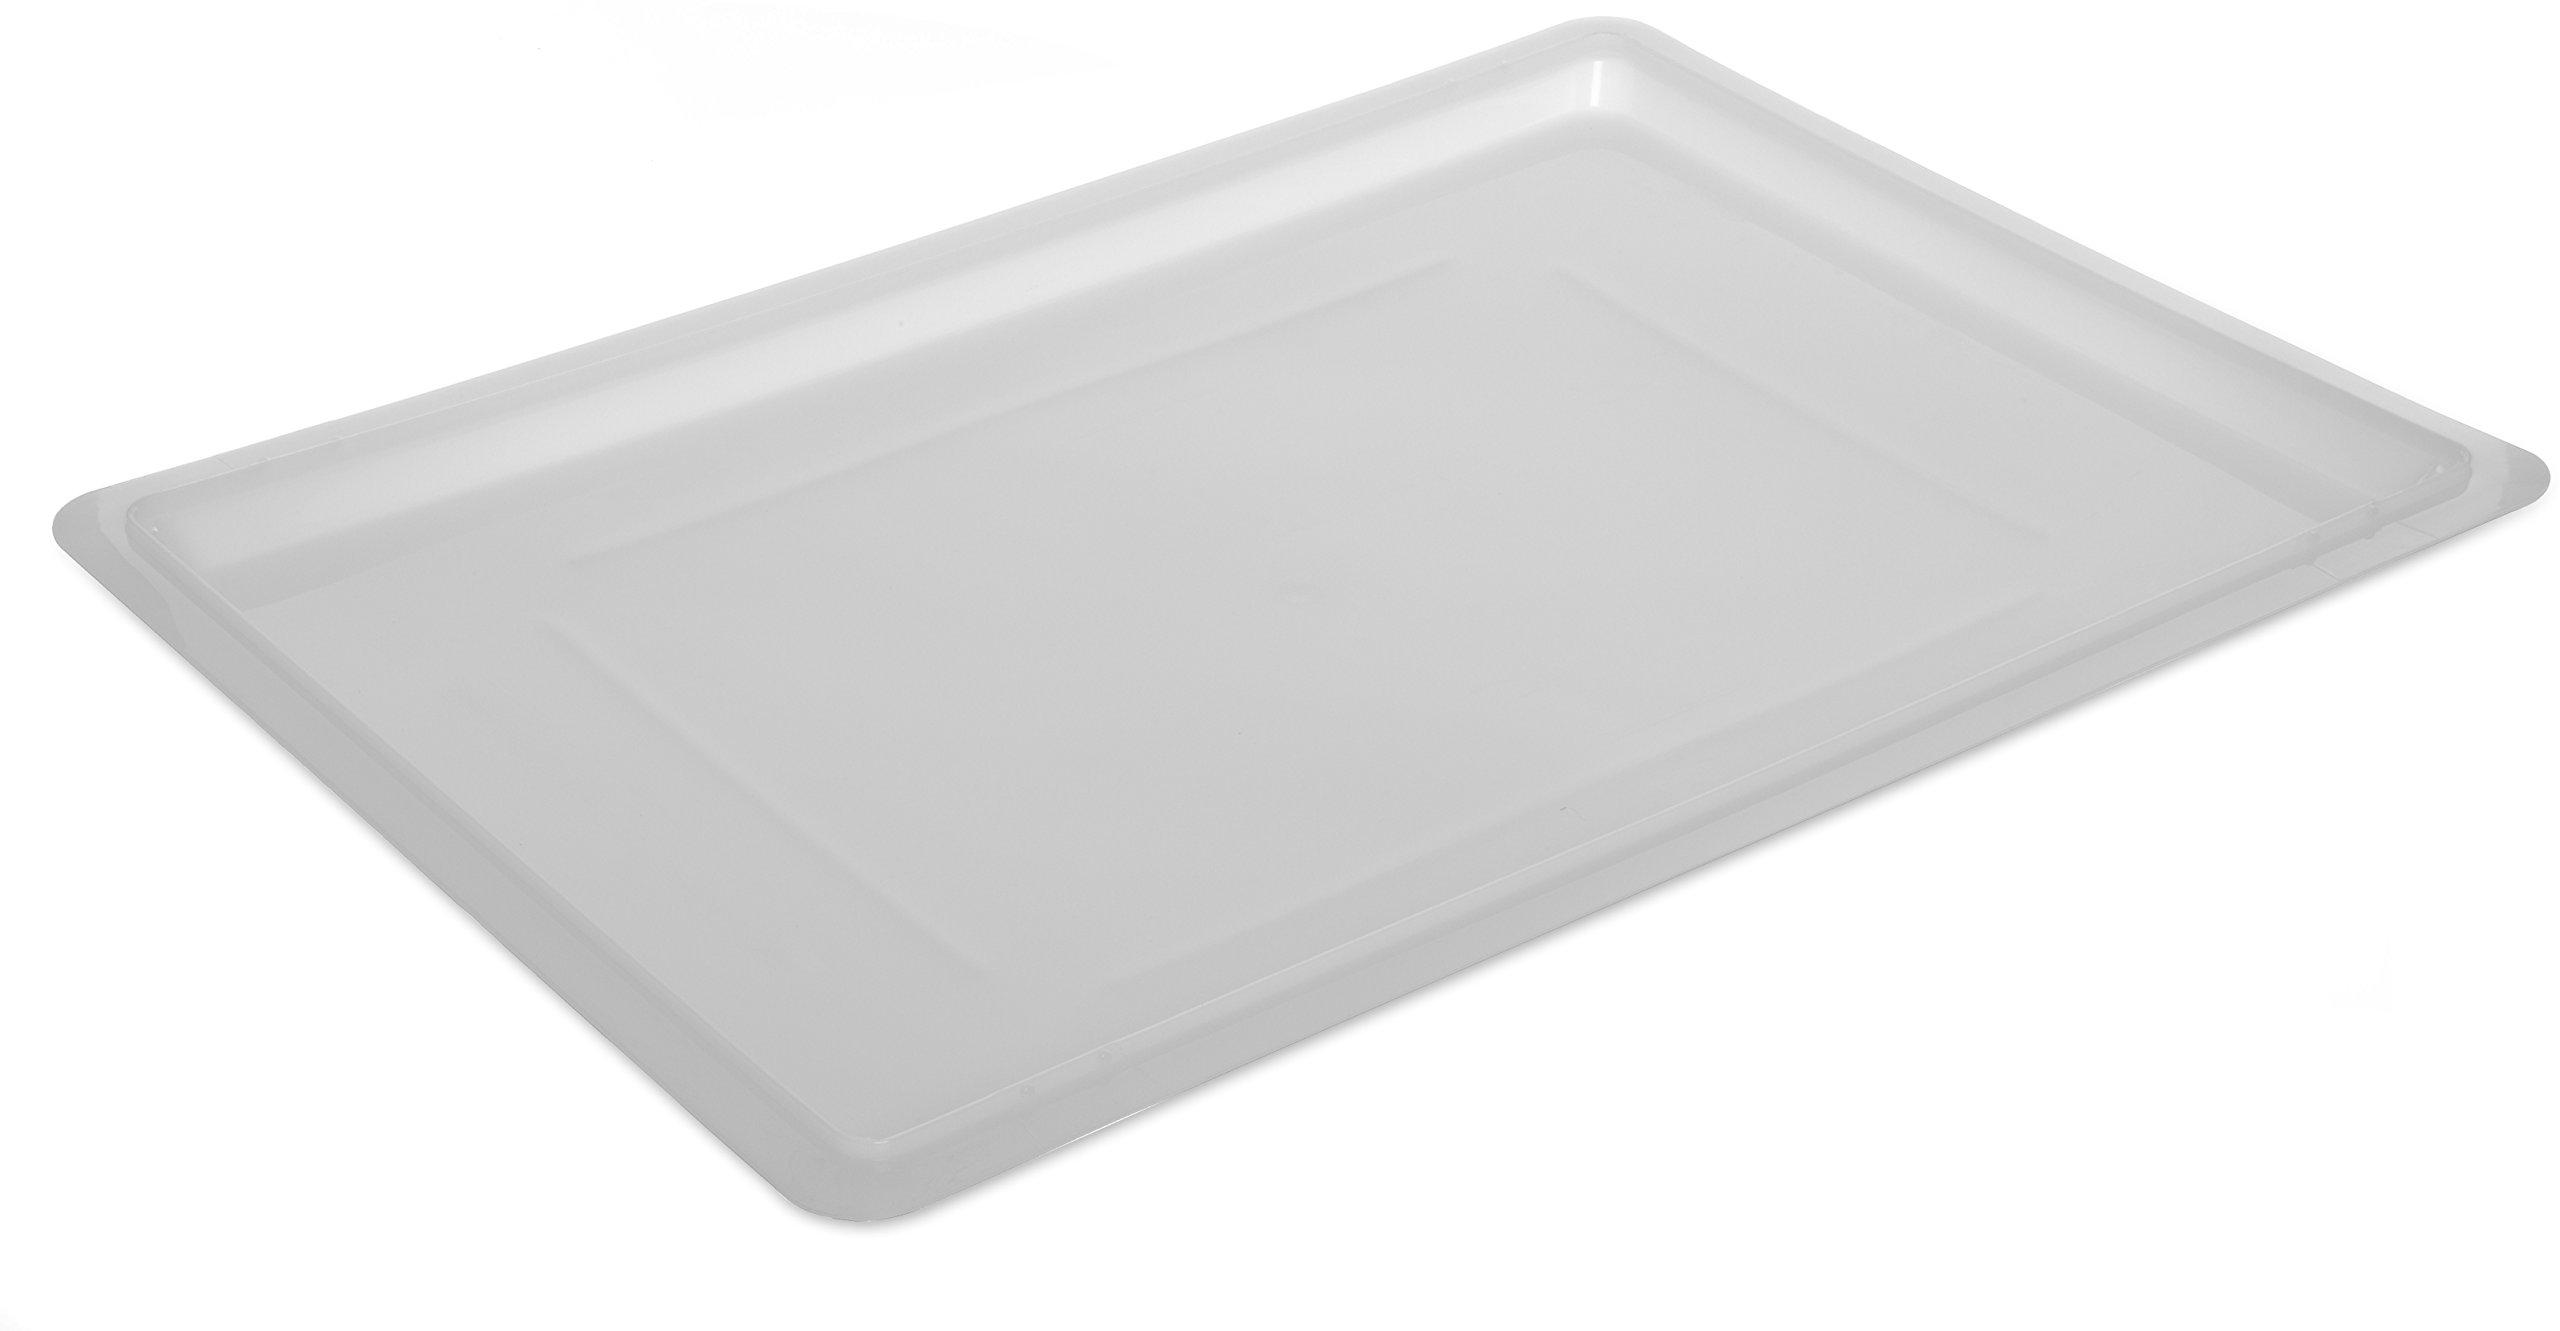 Carlisle 1064702 StorPlus Polyethylene ''Lock-Tight'' Lid, 26 x 18 x 1.28'', White (Case of 6) by Carlisle